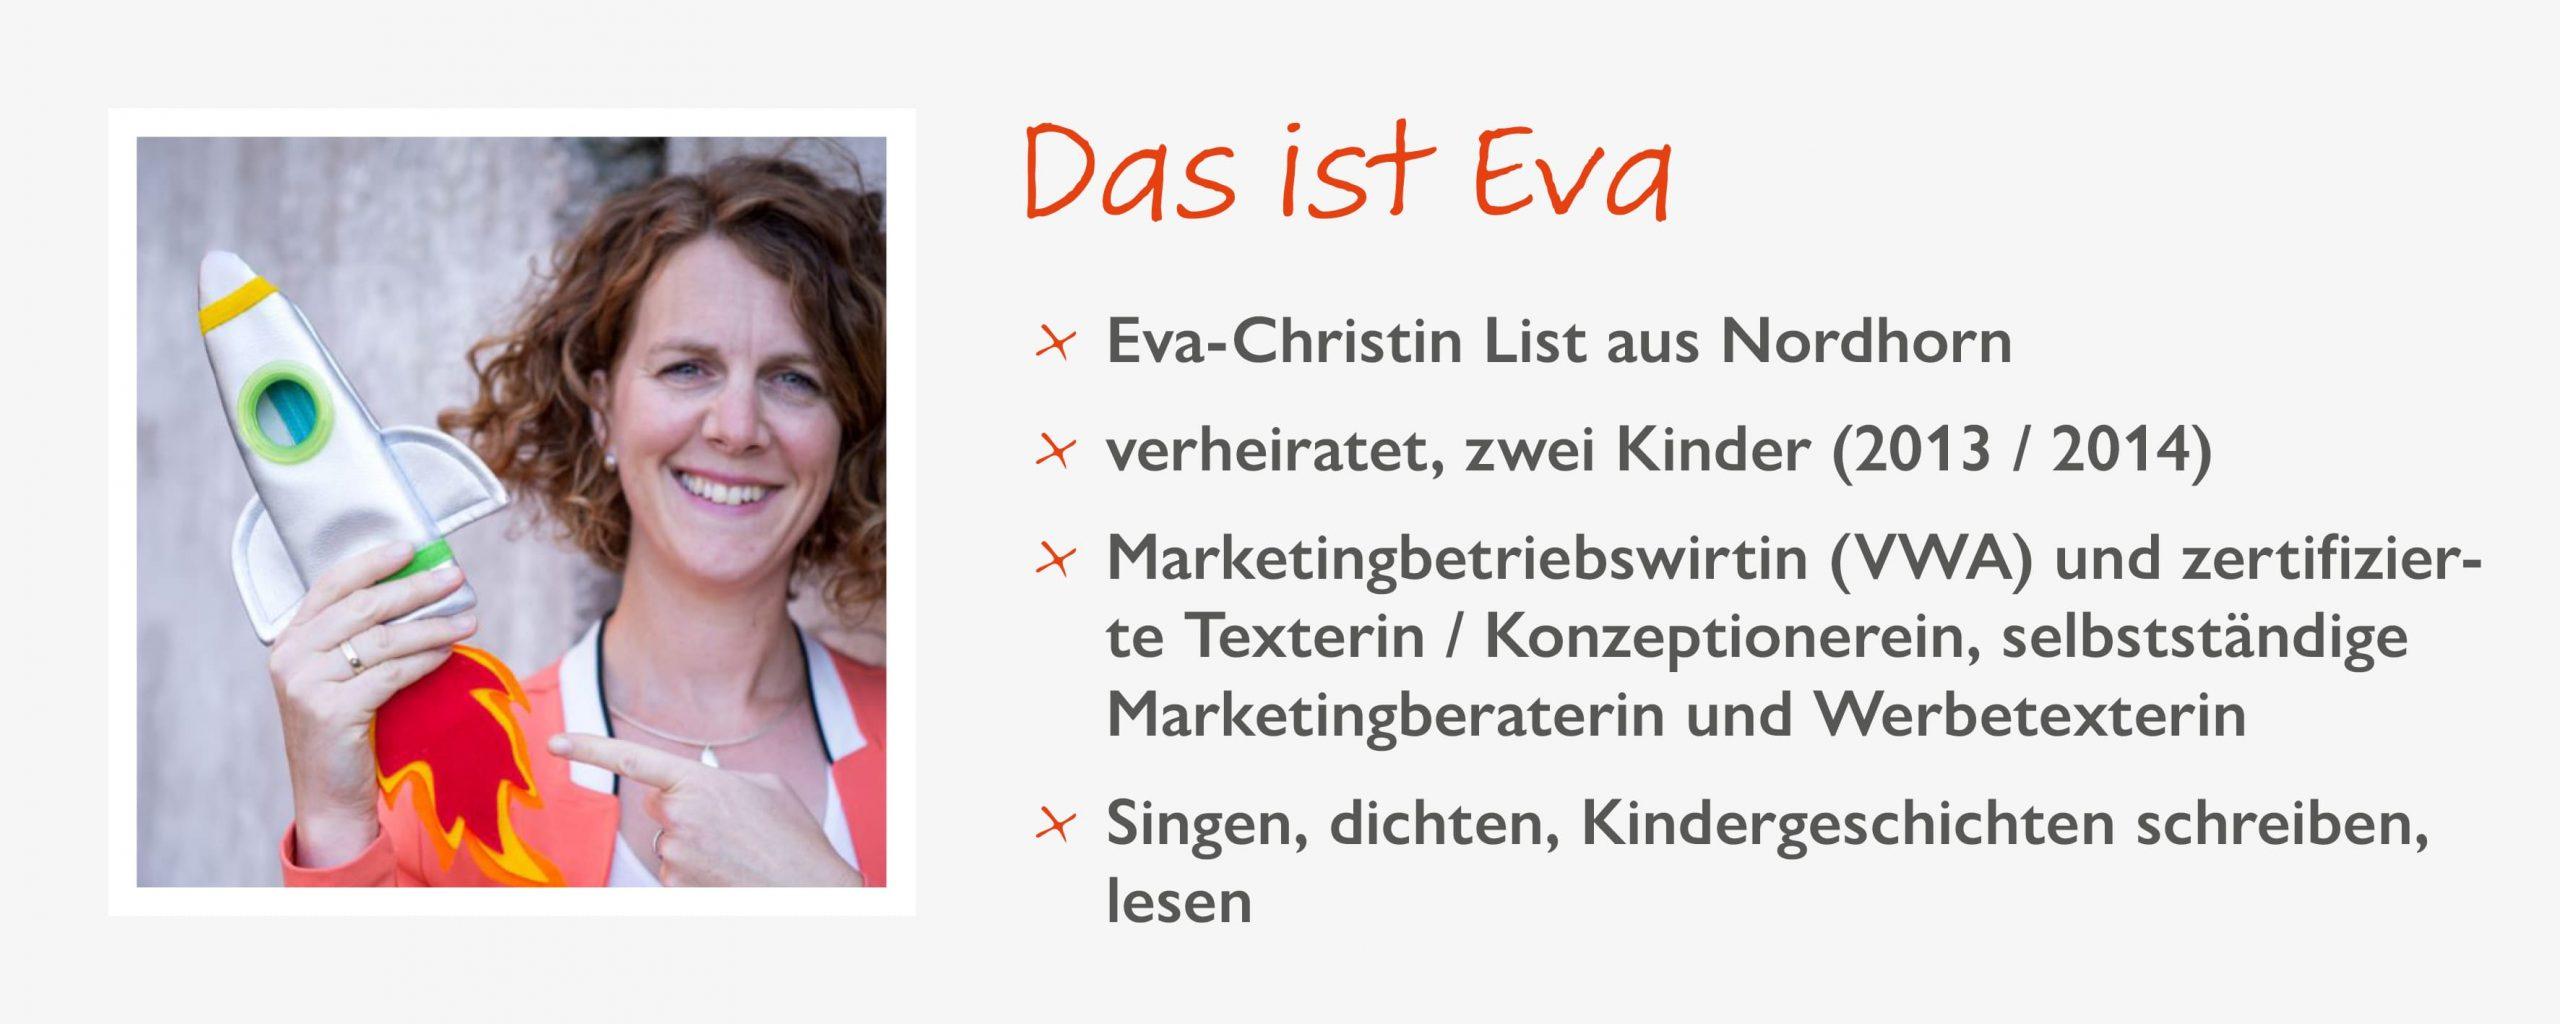 Eva List, marketing-Expertin & Funkenflug-Rakete